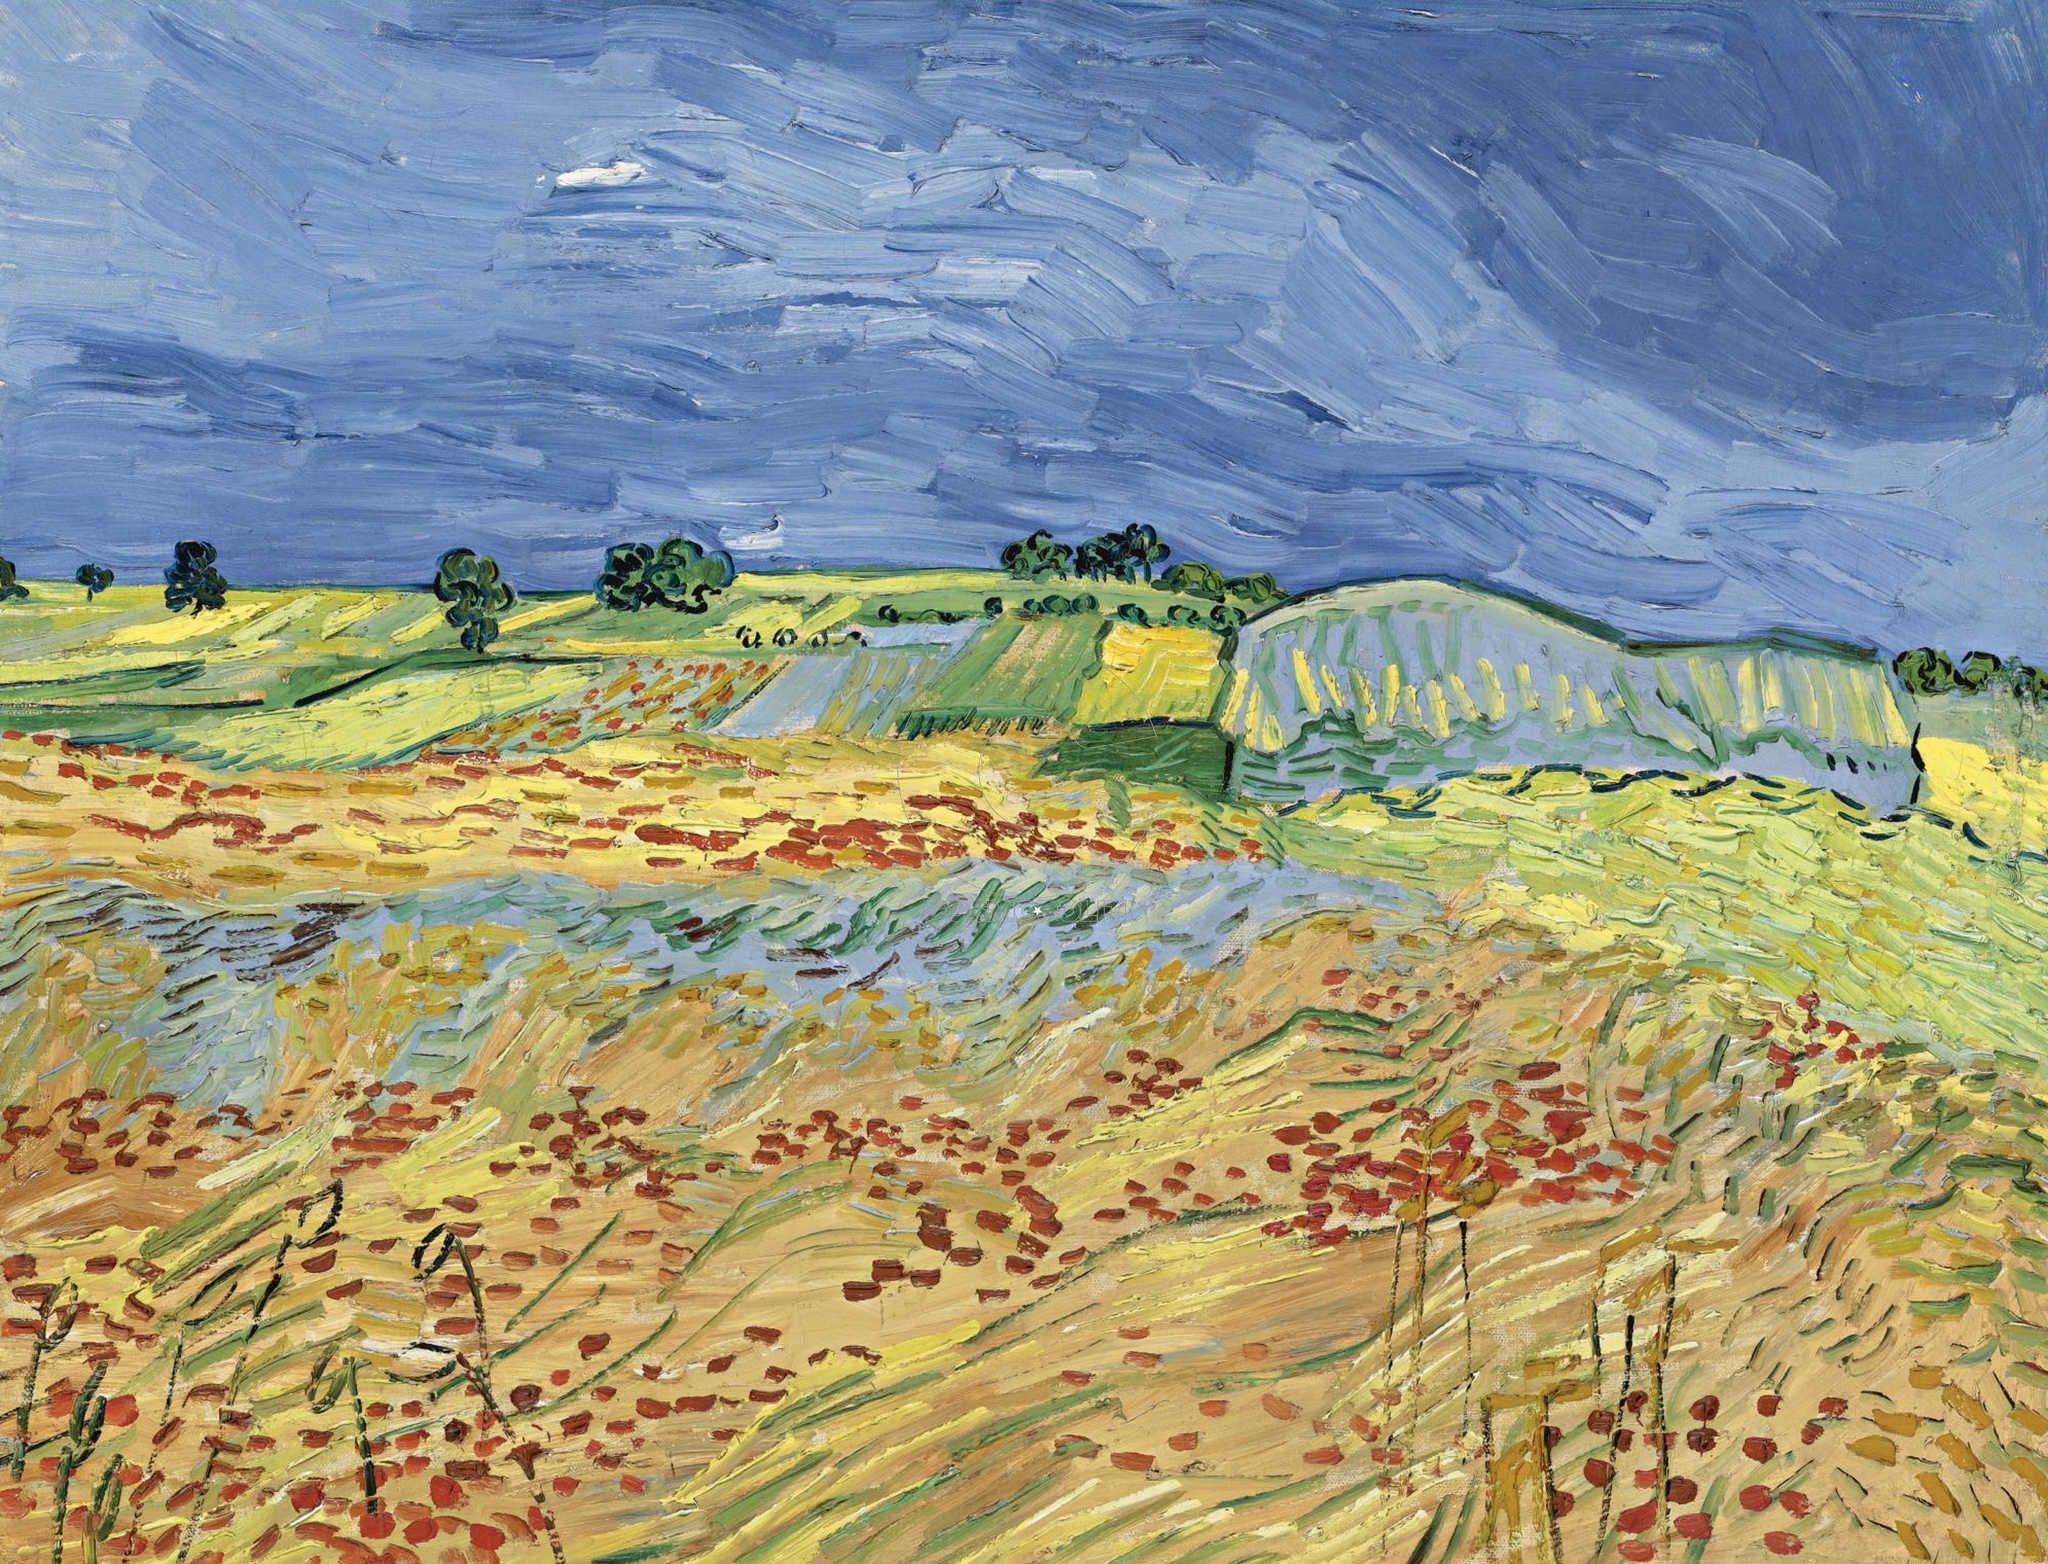 Vincent_van_Gogh_-_The_Fields_(1890)